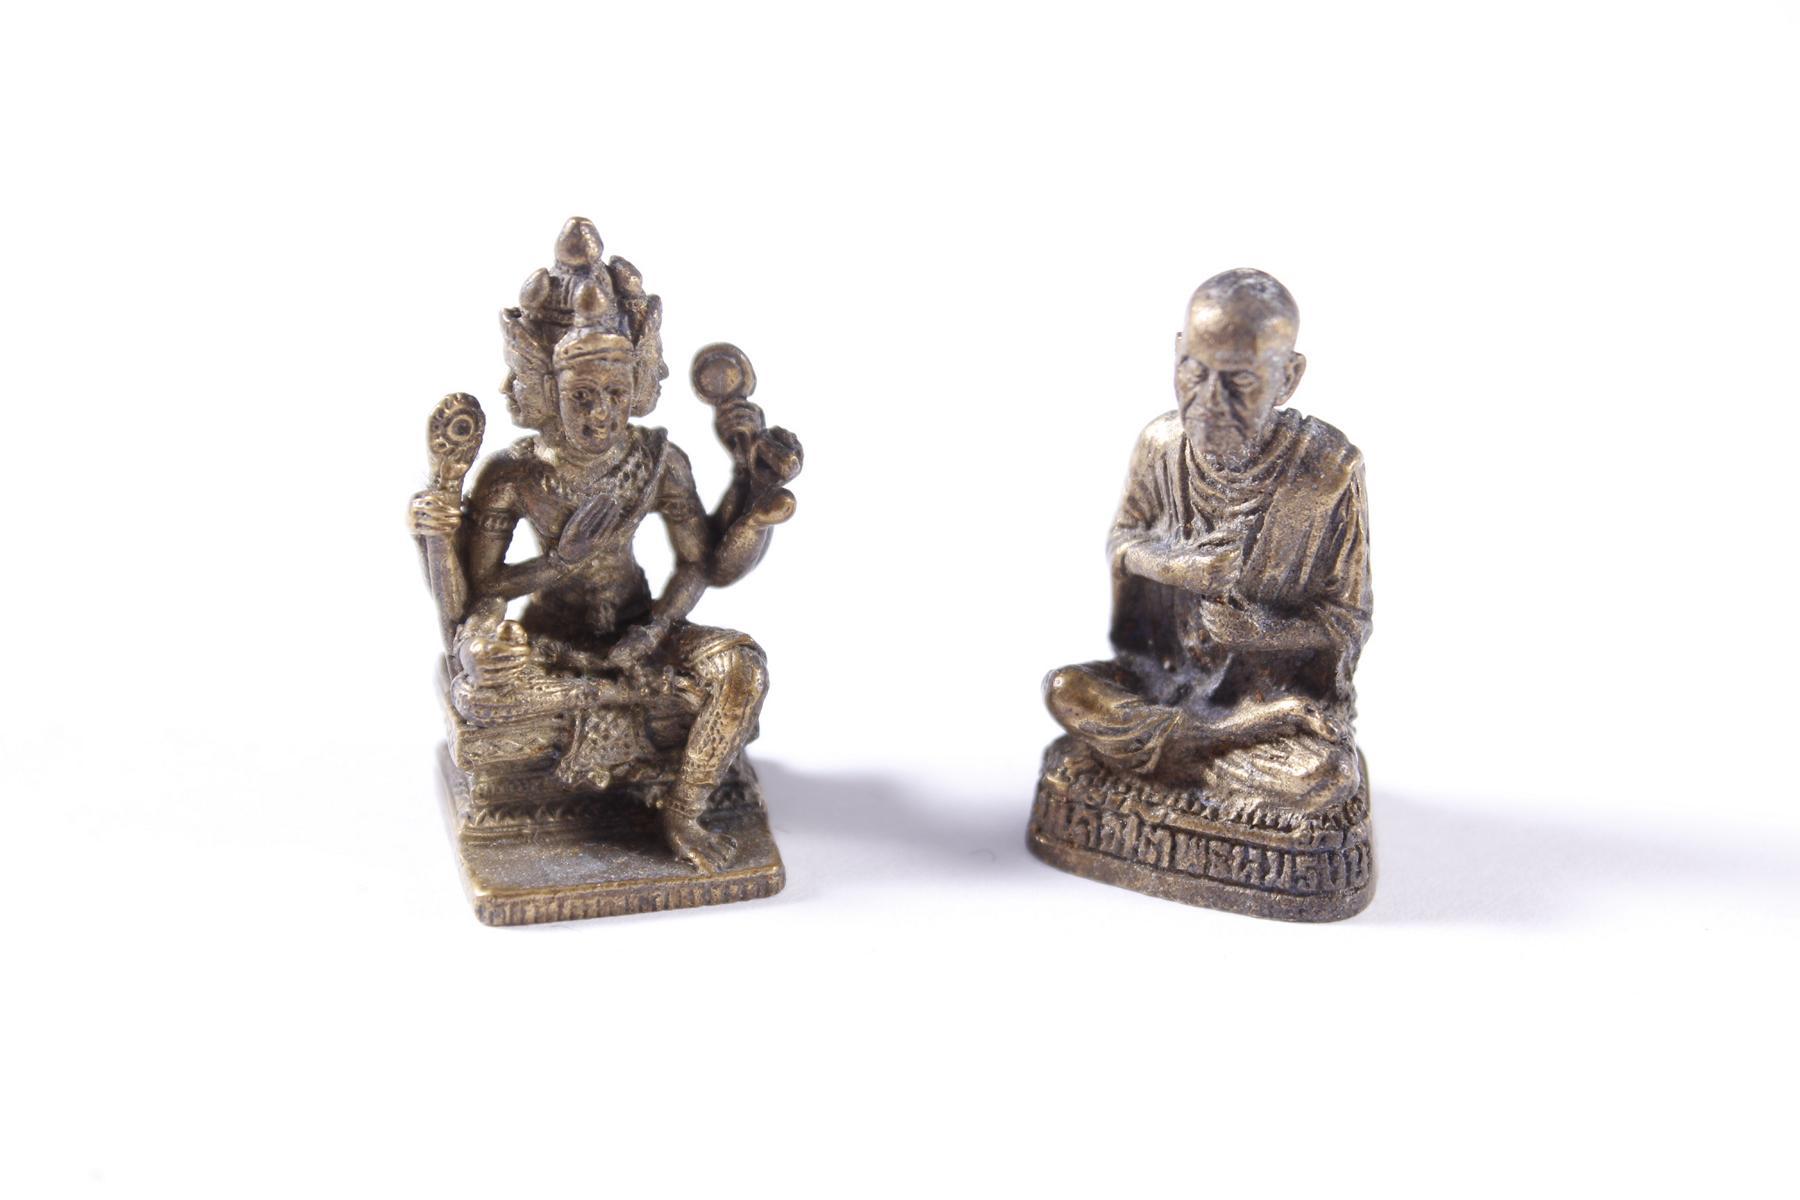 2 Miniatur-Buddhas aus Bronze, Tibet 20. Jahrhundert